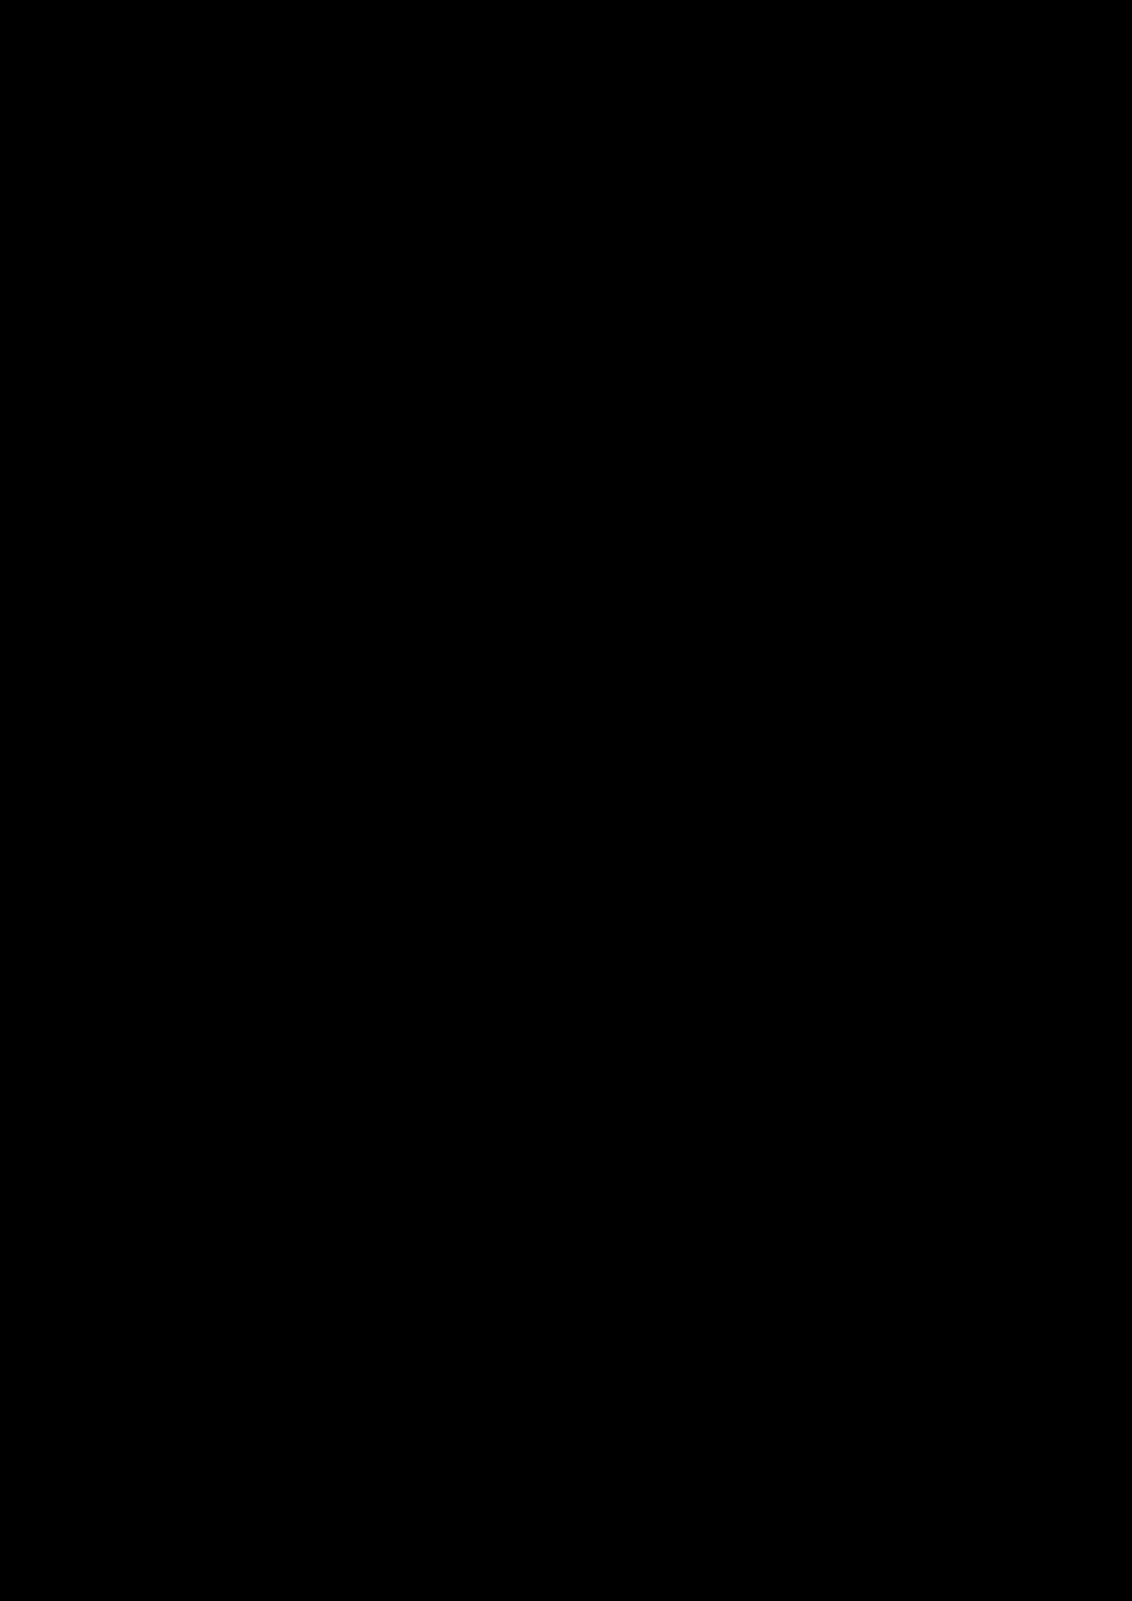 Deklassirovannyim elementam slide, Image 4